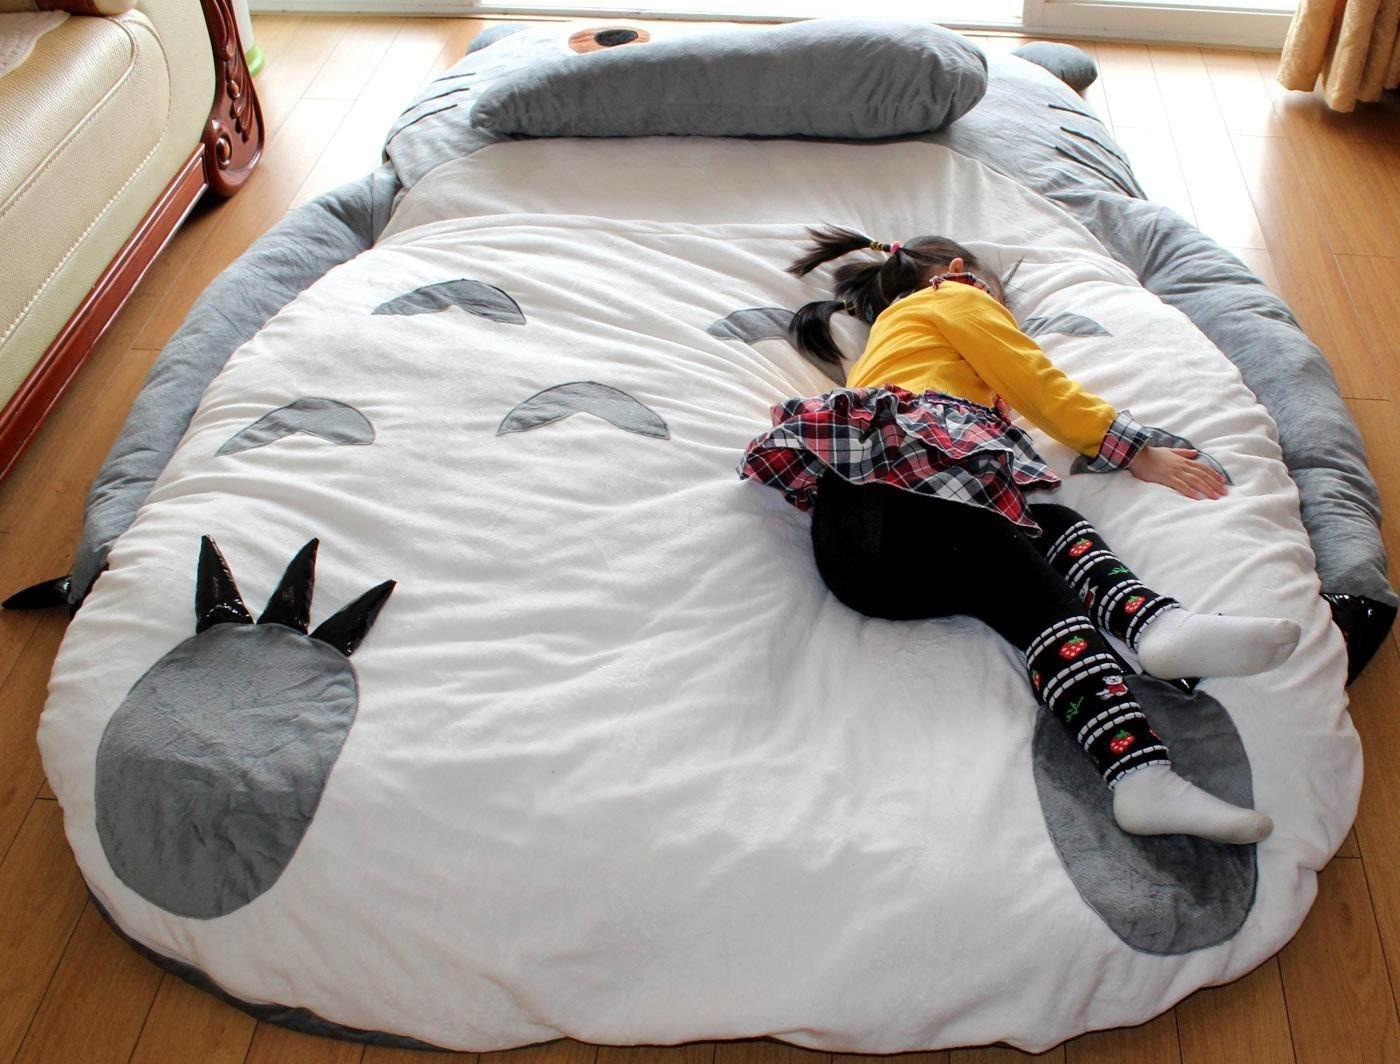 Get Quotations Huge Cute Cartoon 390cm Totoro Sleeping Bag Bed Double 3 9x2